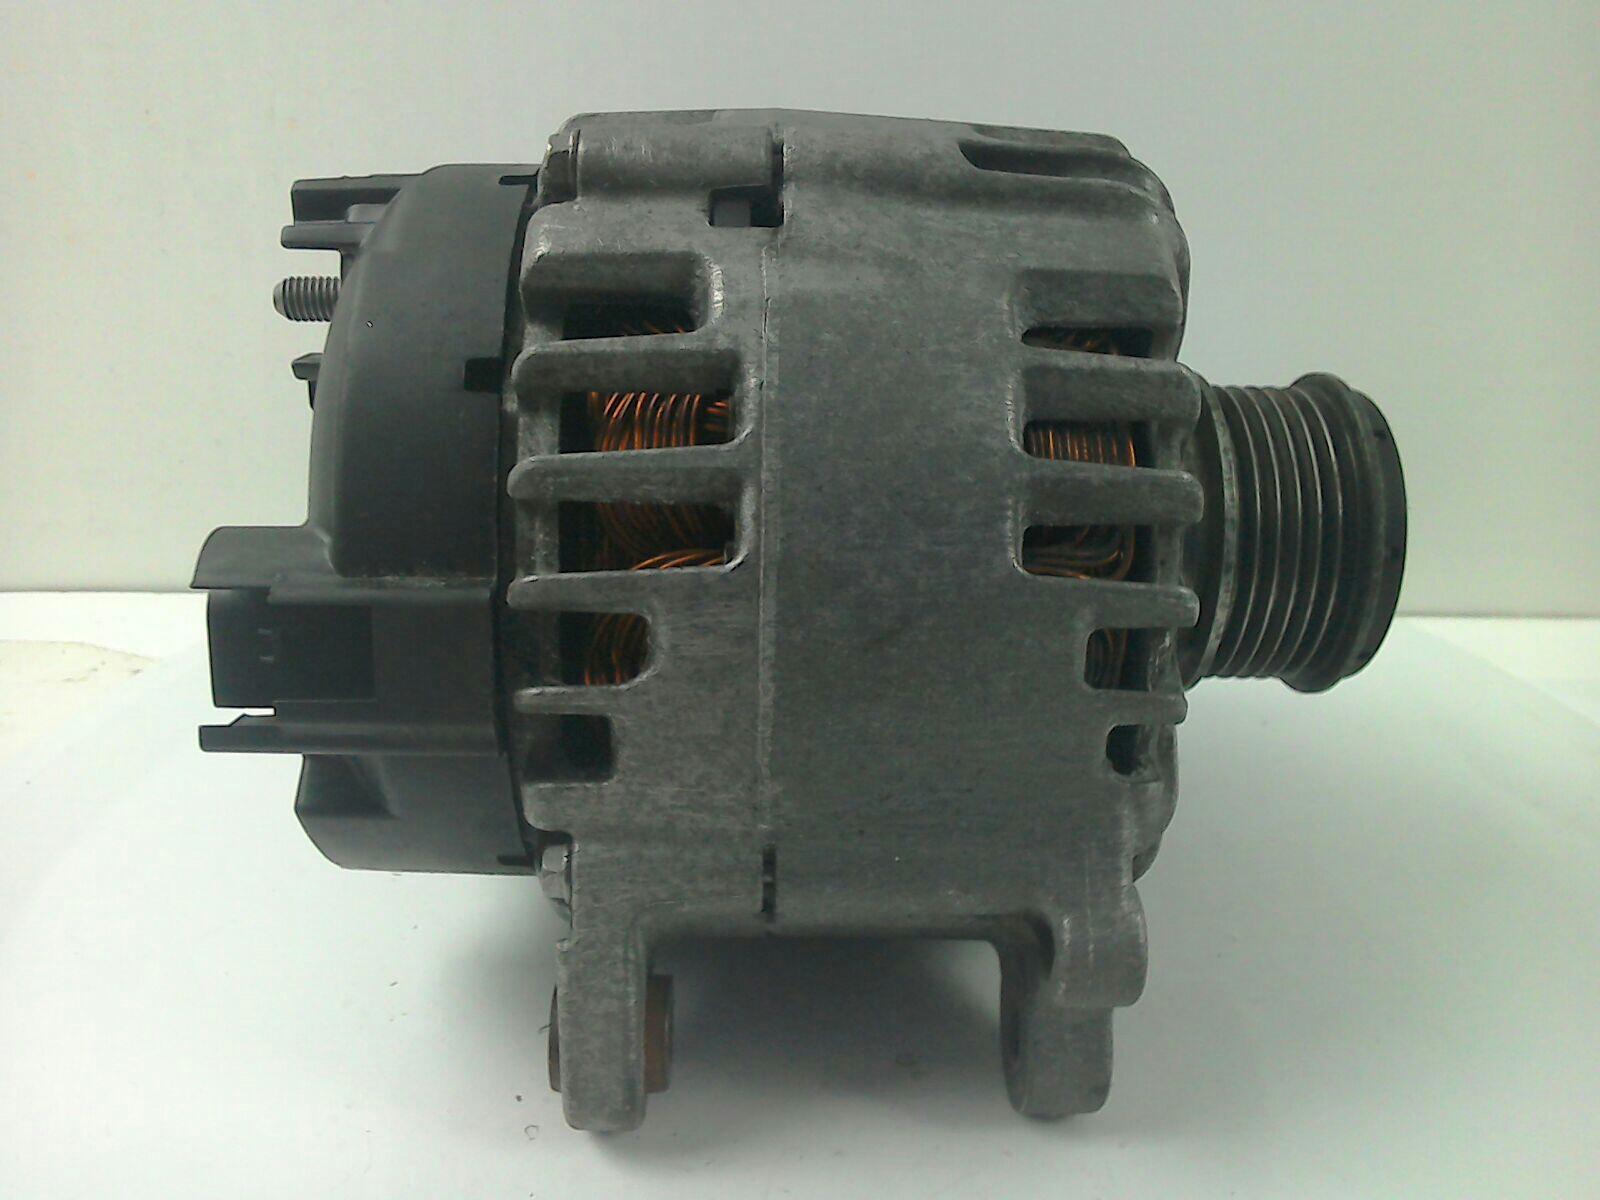 audi a3 2008 to 2013 alternator diesel manual for sale from scb rh scbvehicledismantlers co uk Audi A3 Manual PDF Audi A3 Service Manual